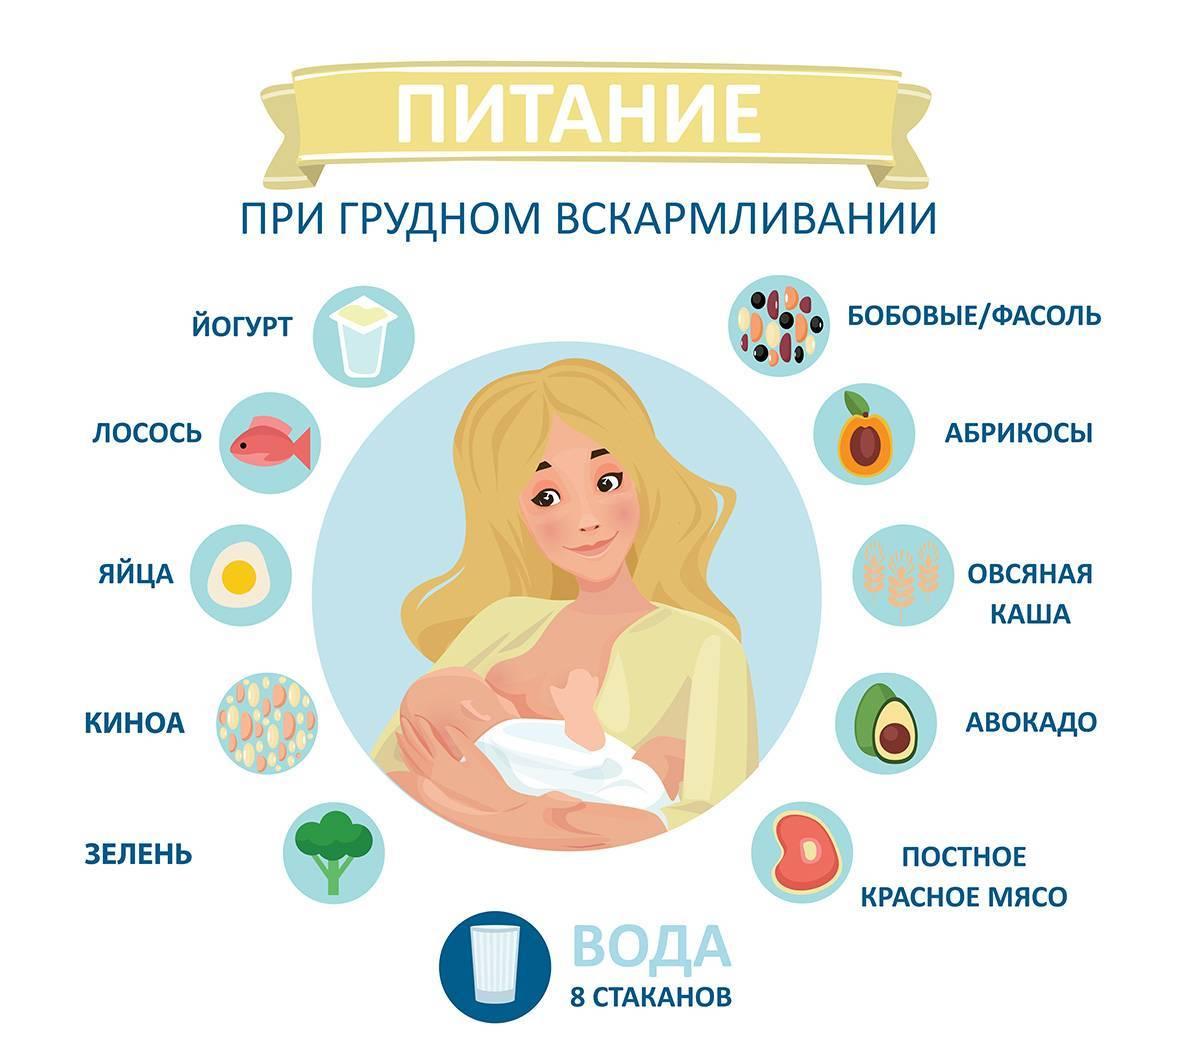 Изжога: причины и профилактика (молодкина о. а.)